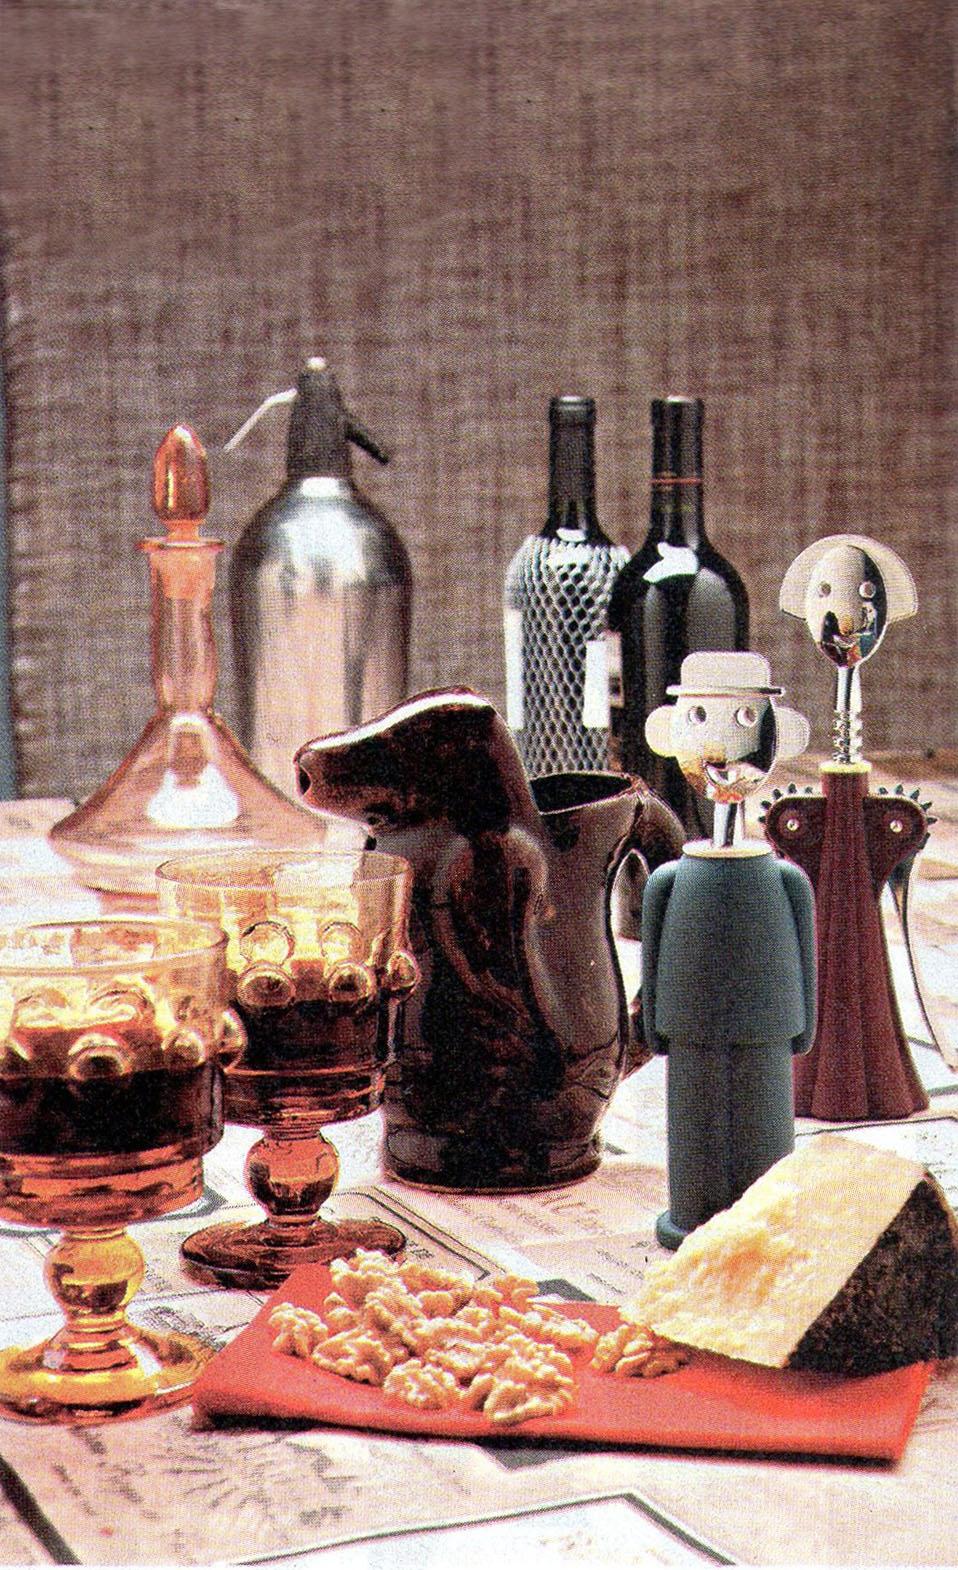 Depiction of Vino de Argentina